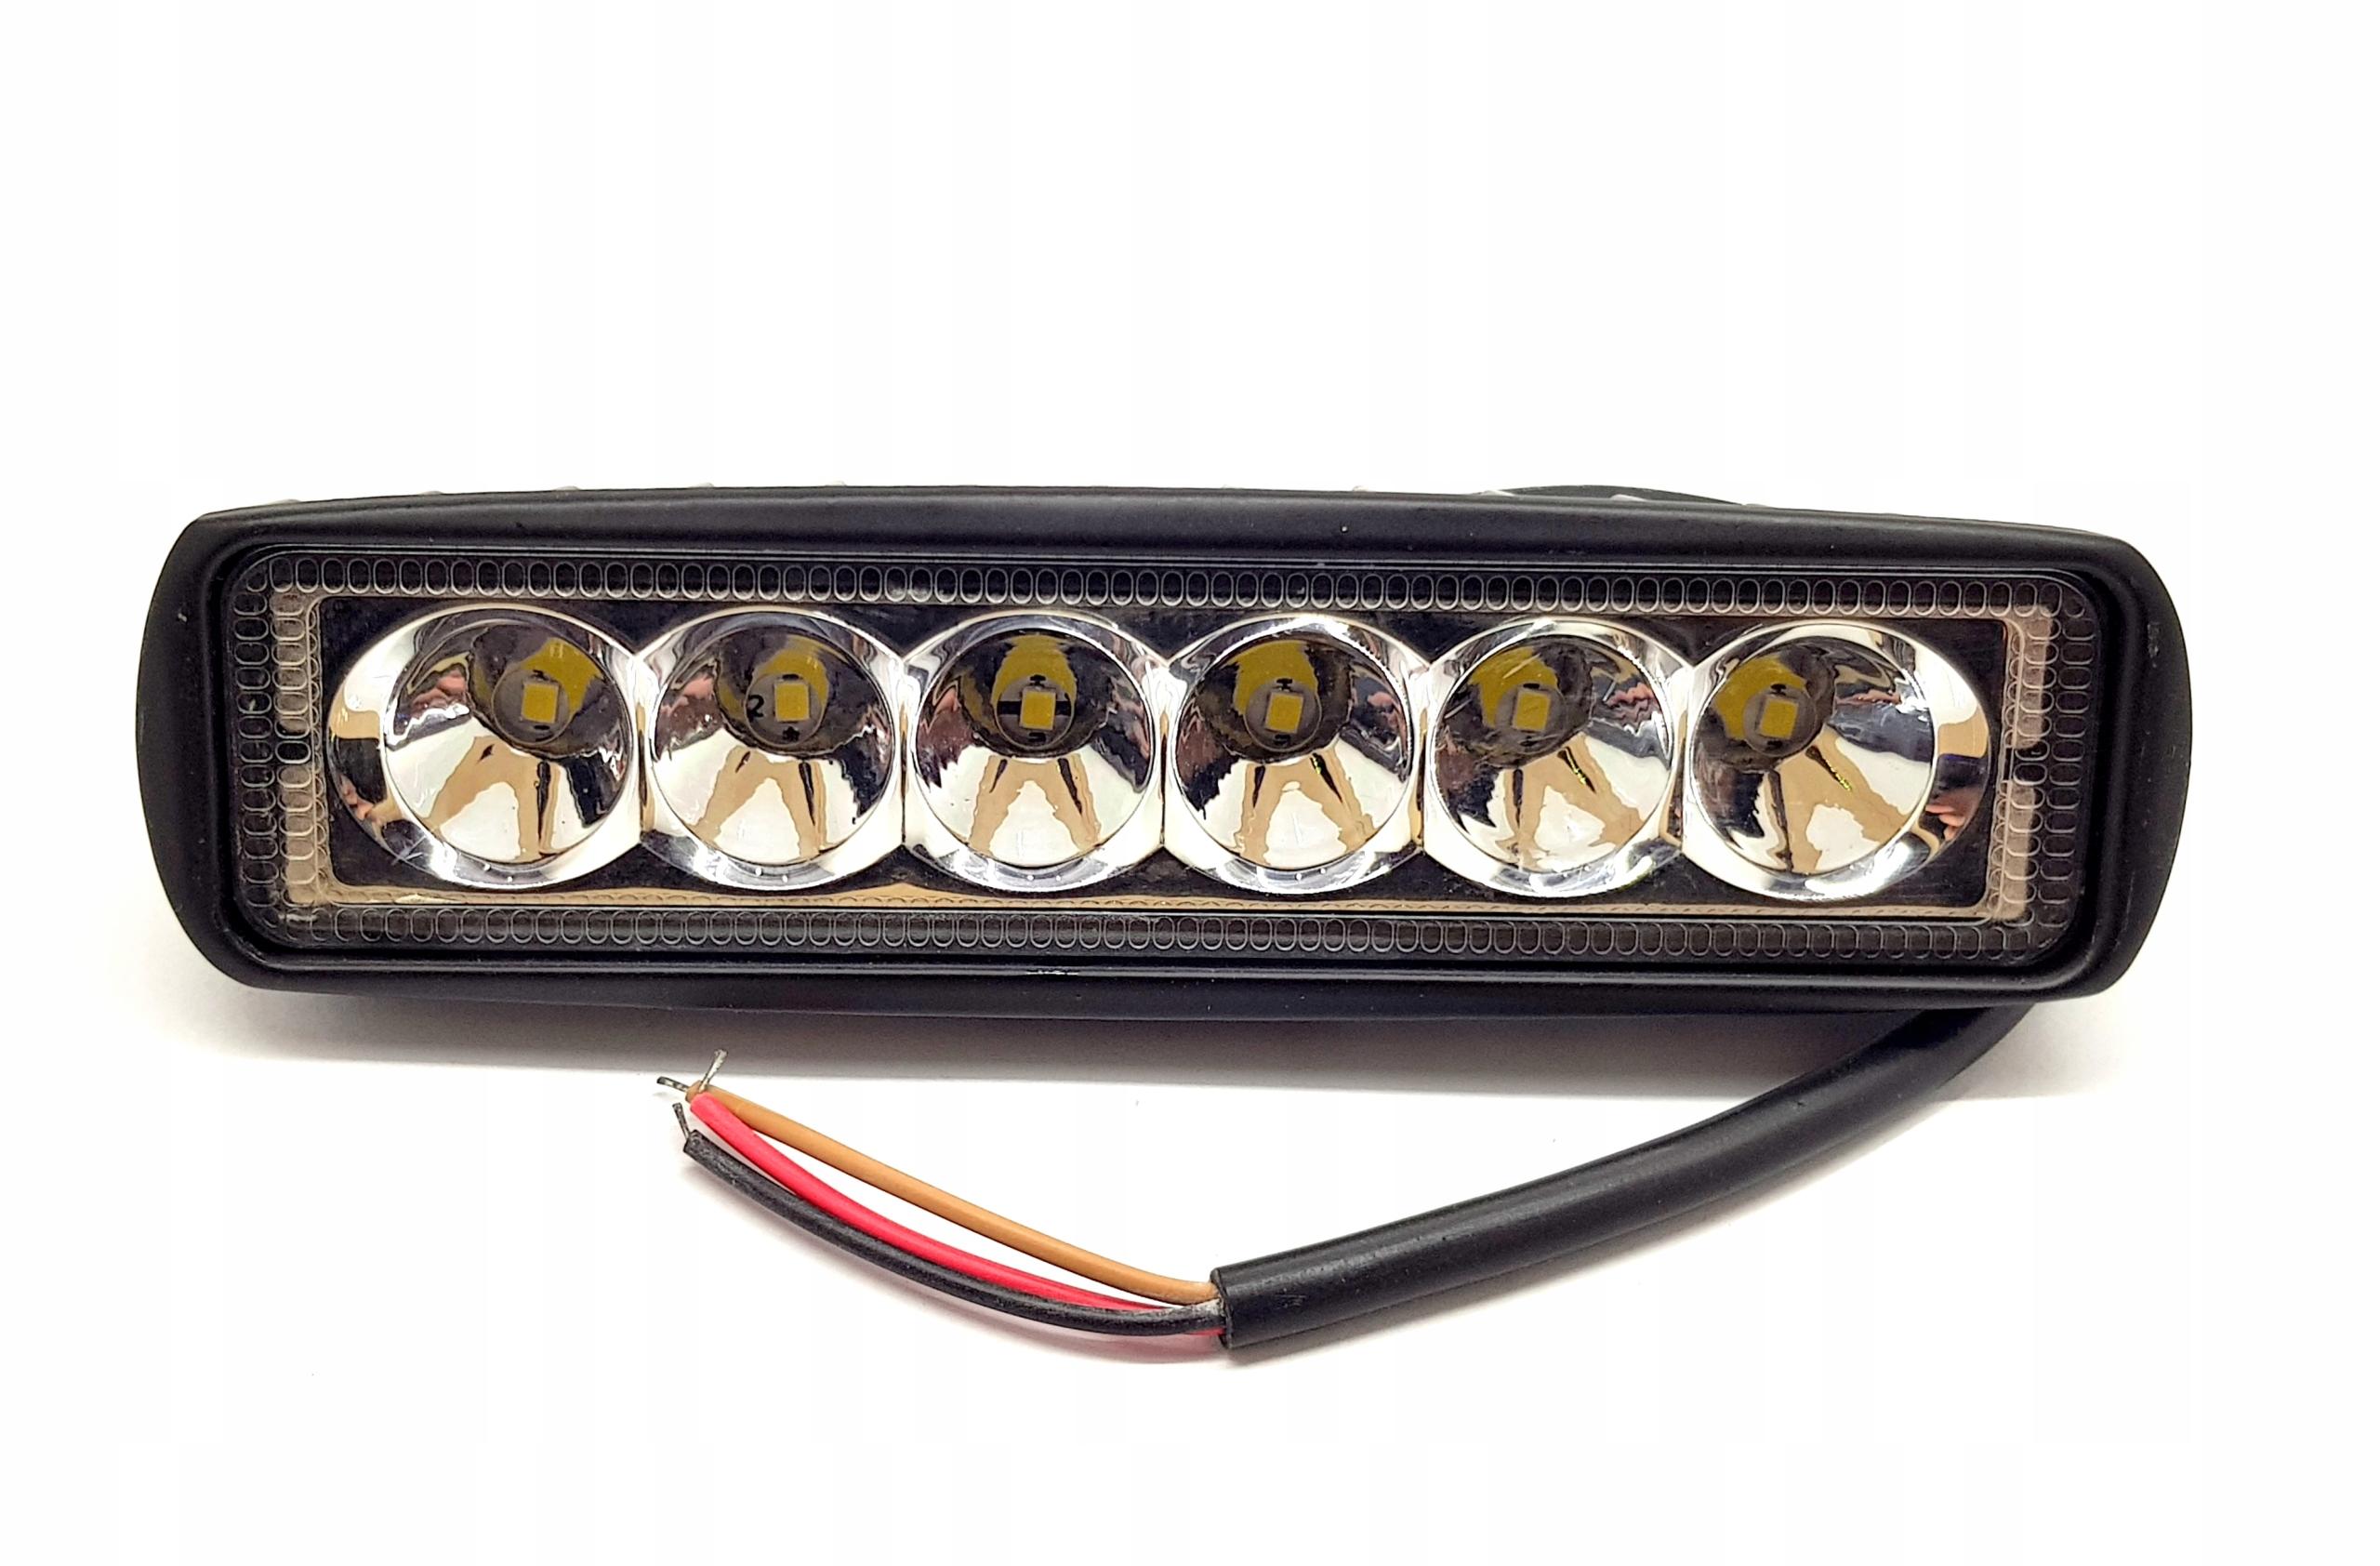 галоген led лампа многофункциональная панель offroad 18w